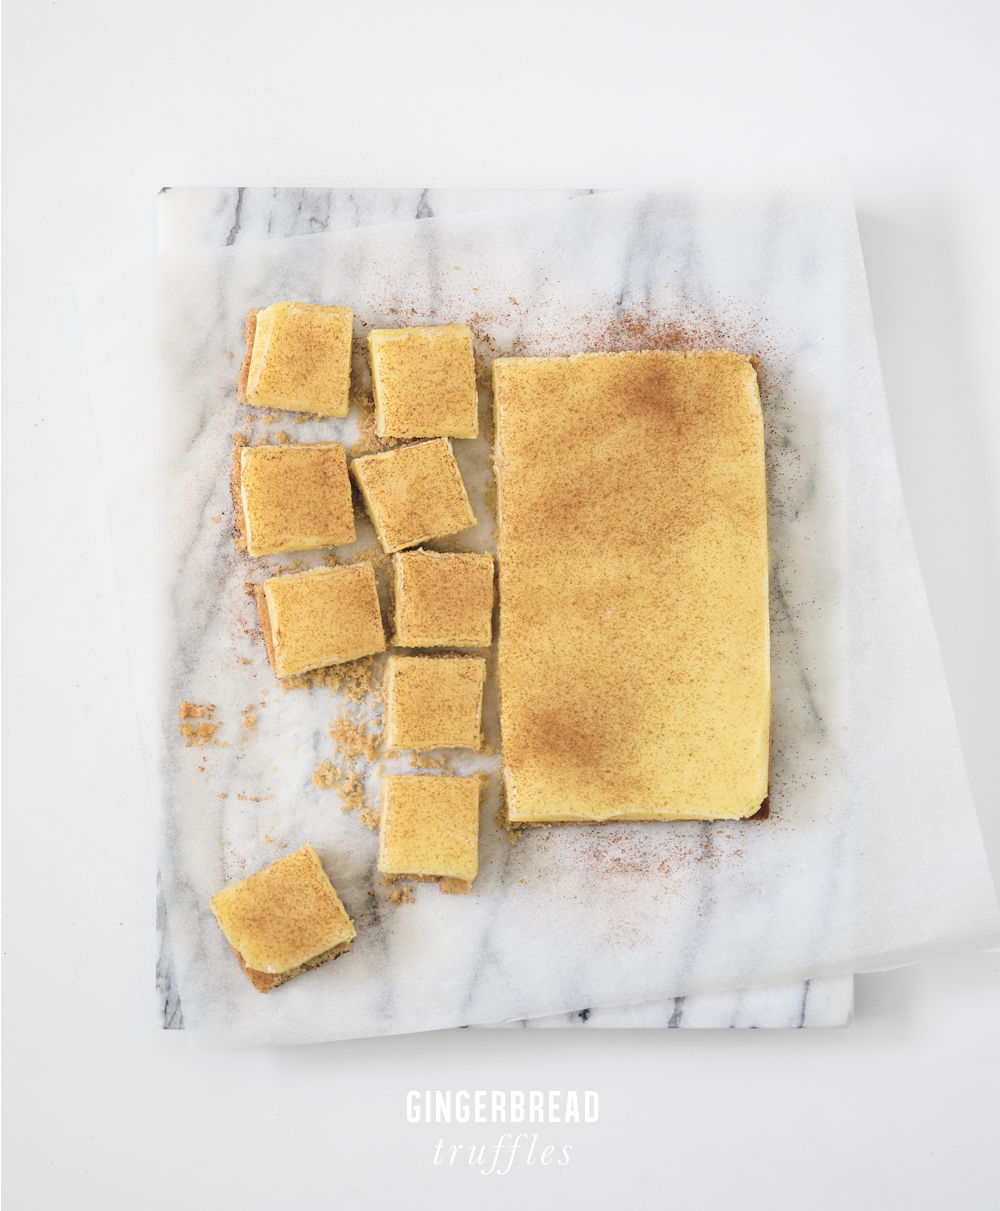 Erika Rax - Gingerbread Truffles